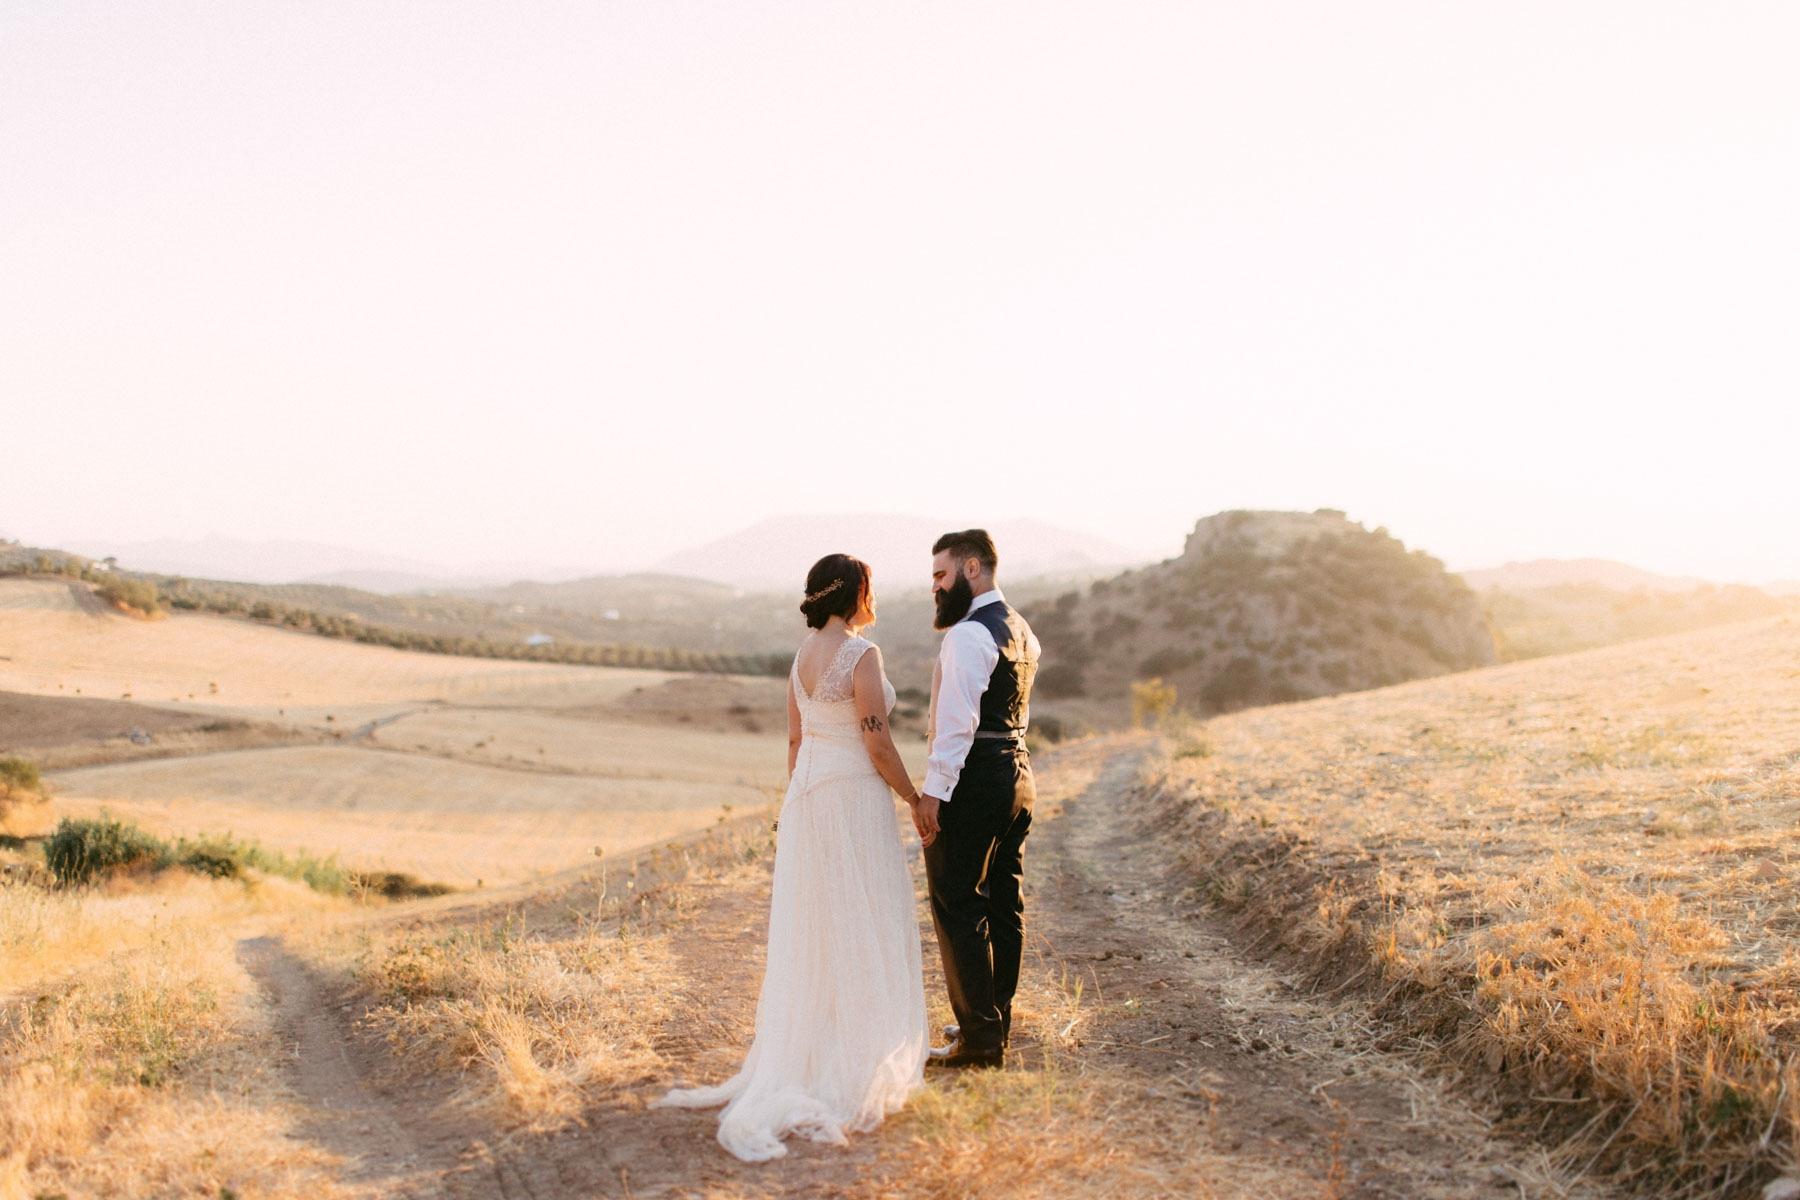 fotografo de bodas Jairo Crena-229